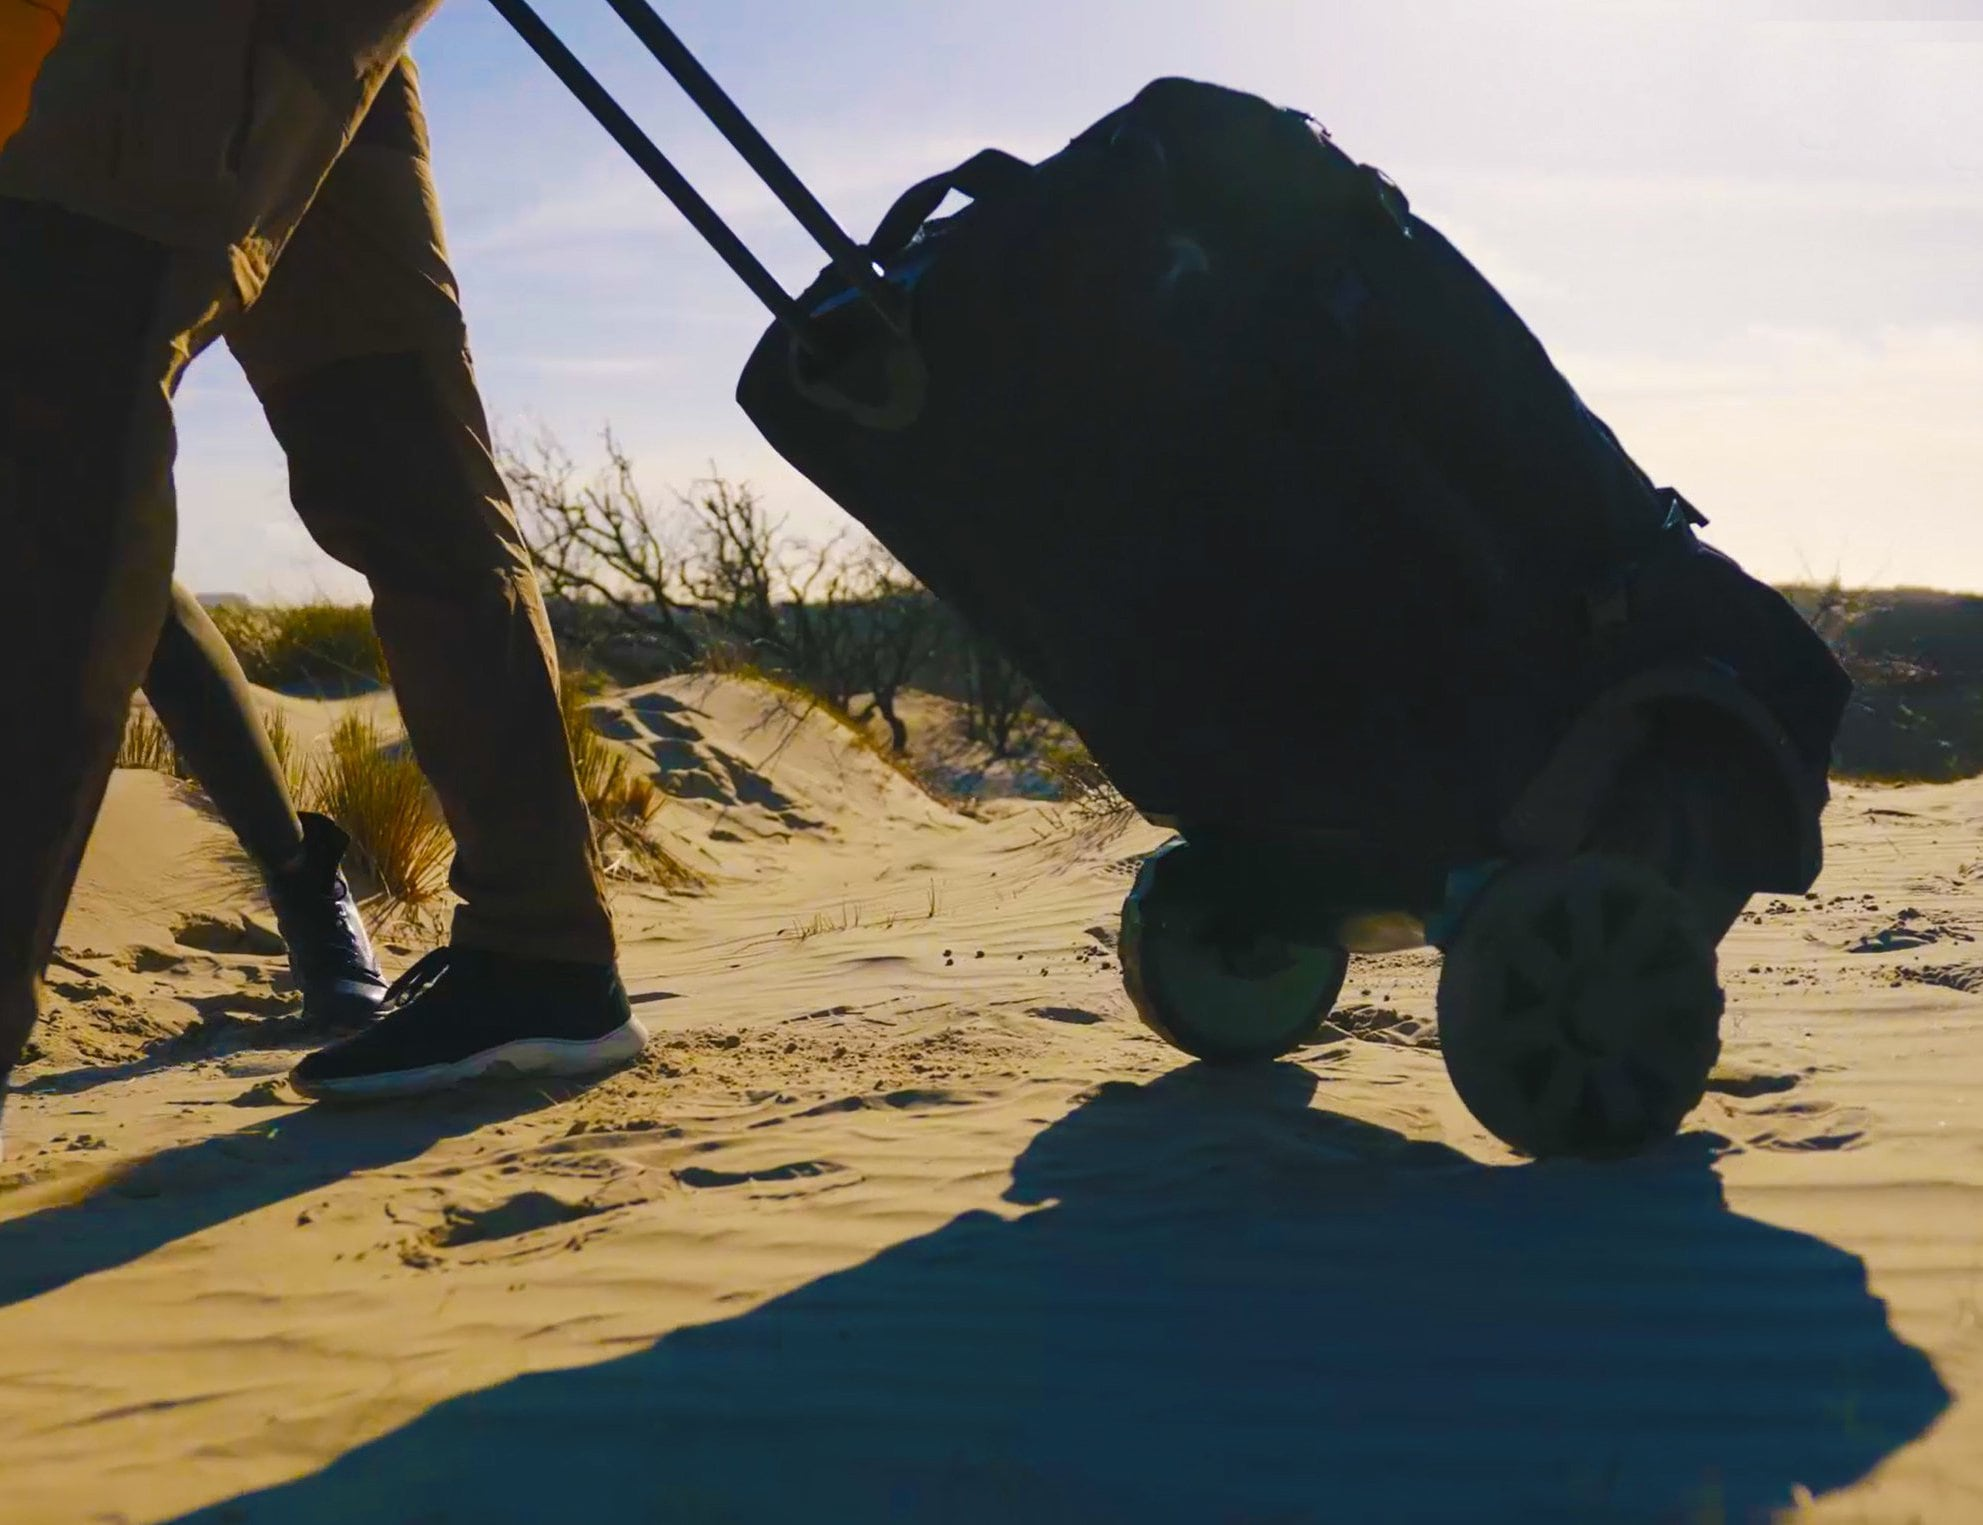 GRINGO All-Terrain Wheeled Travel Bag lets you tackle any terrain